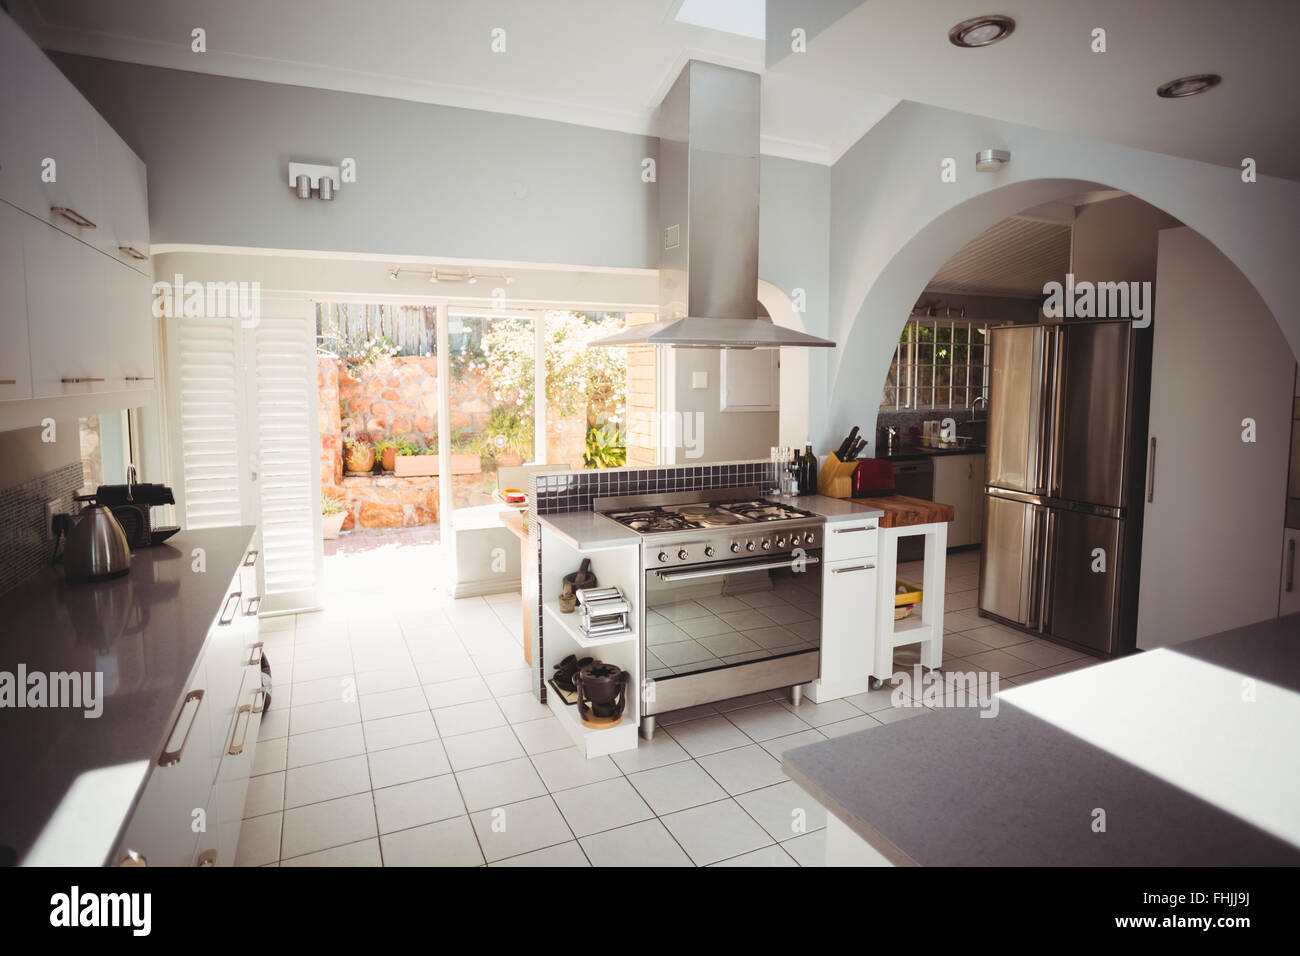 Cocina en un elegante hogar Imagen De Stock